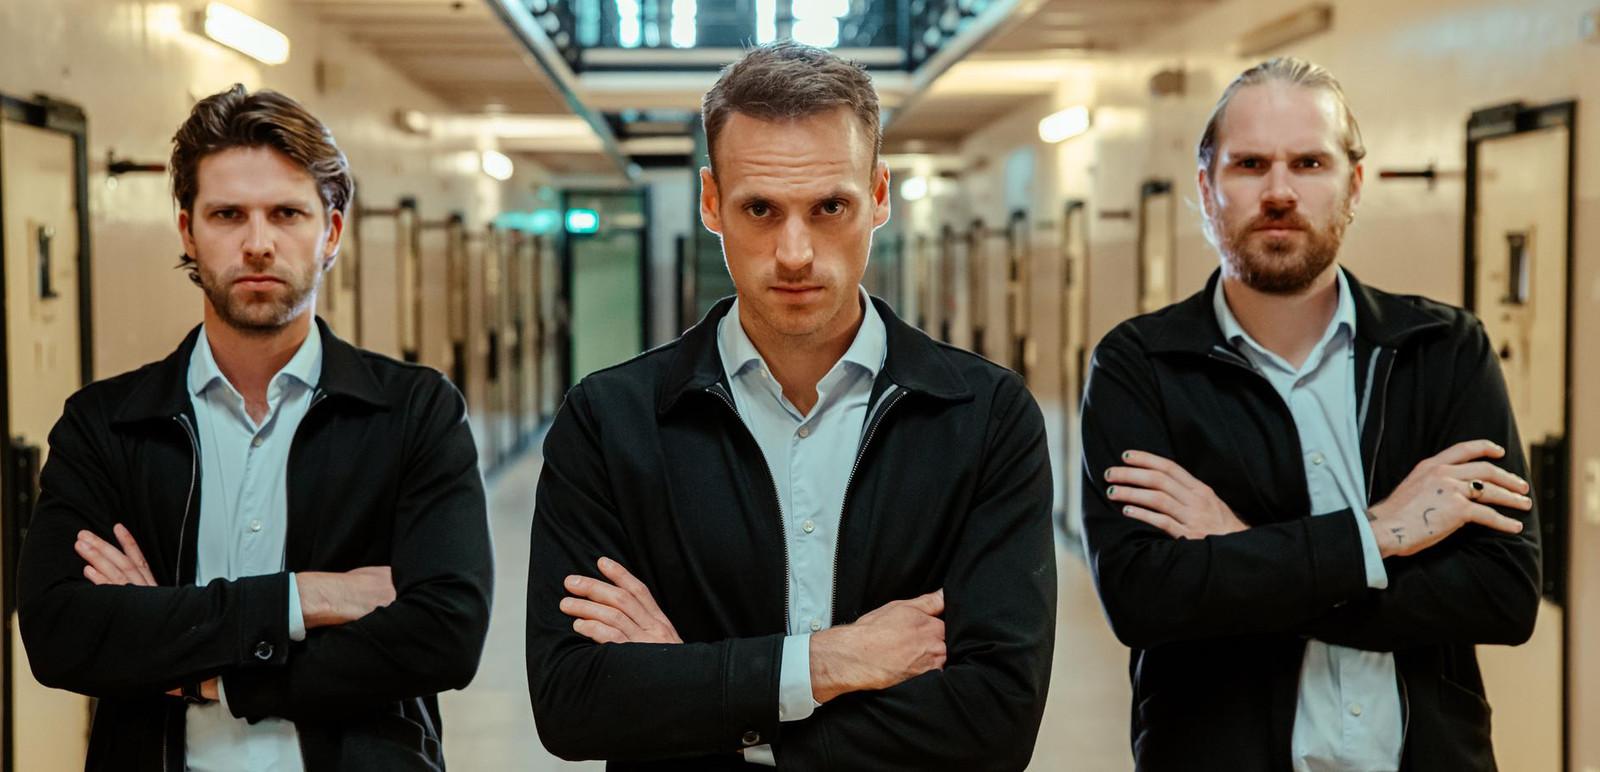 De mannen van stuk TV, vlnr: Thomas, Giel en Stefan